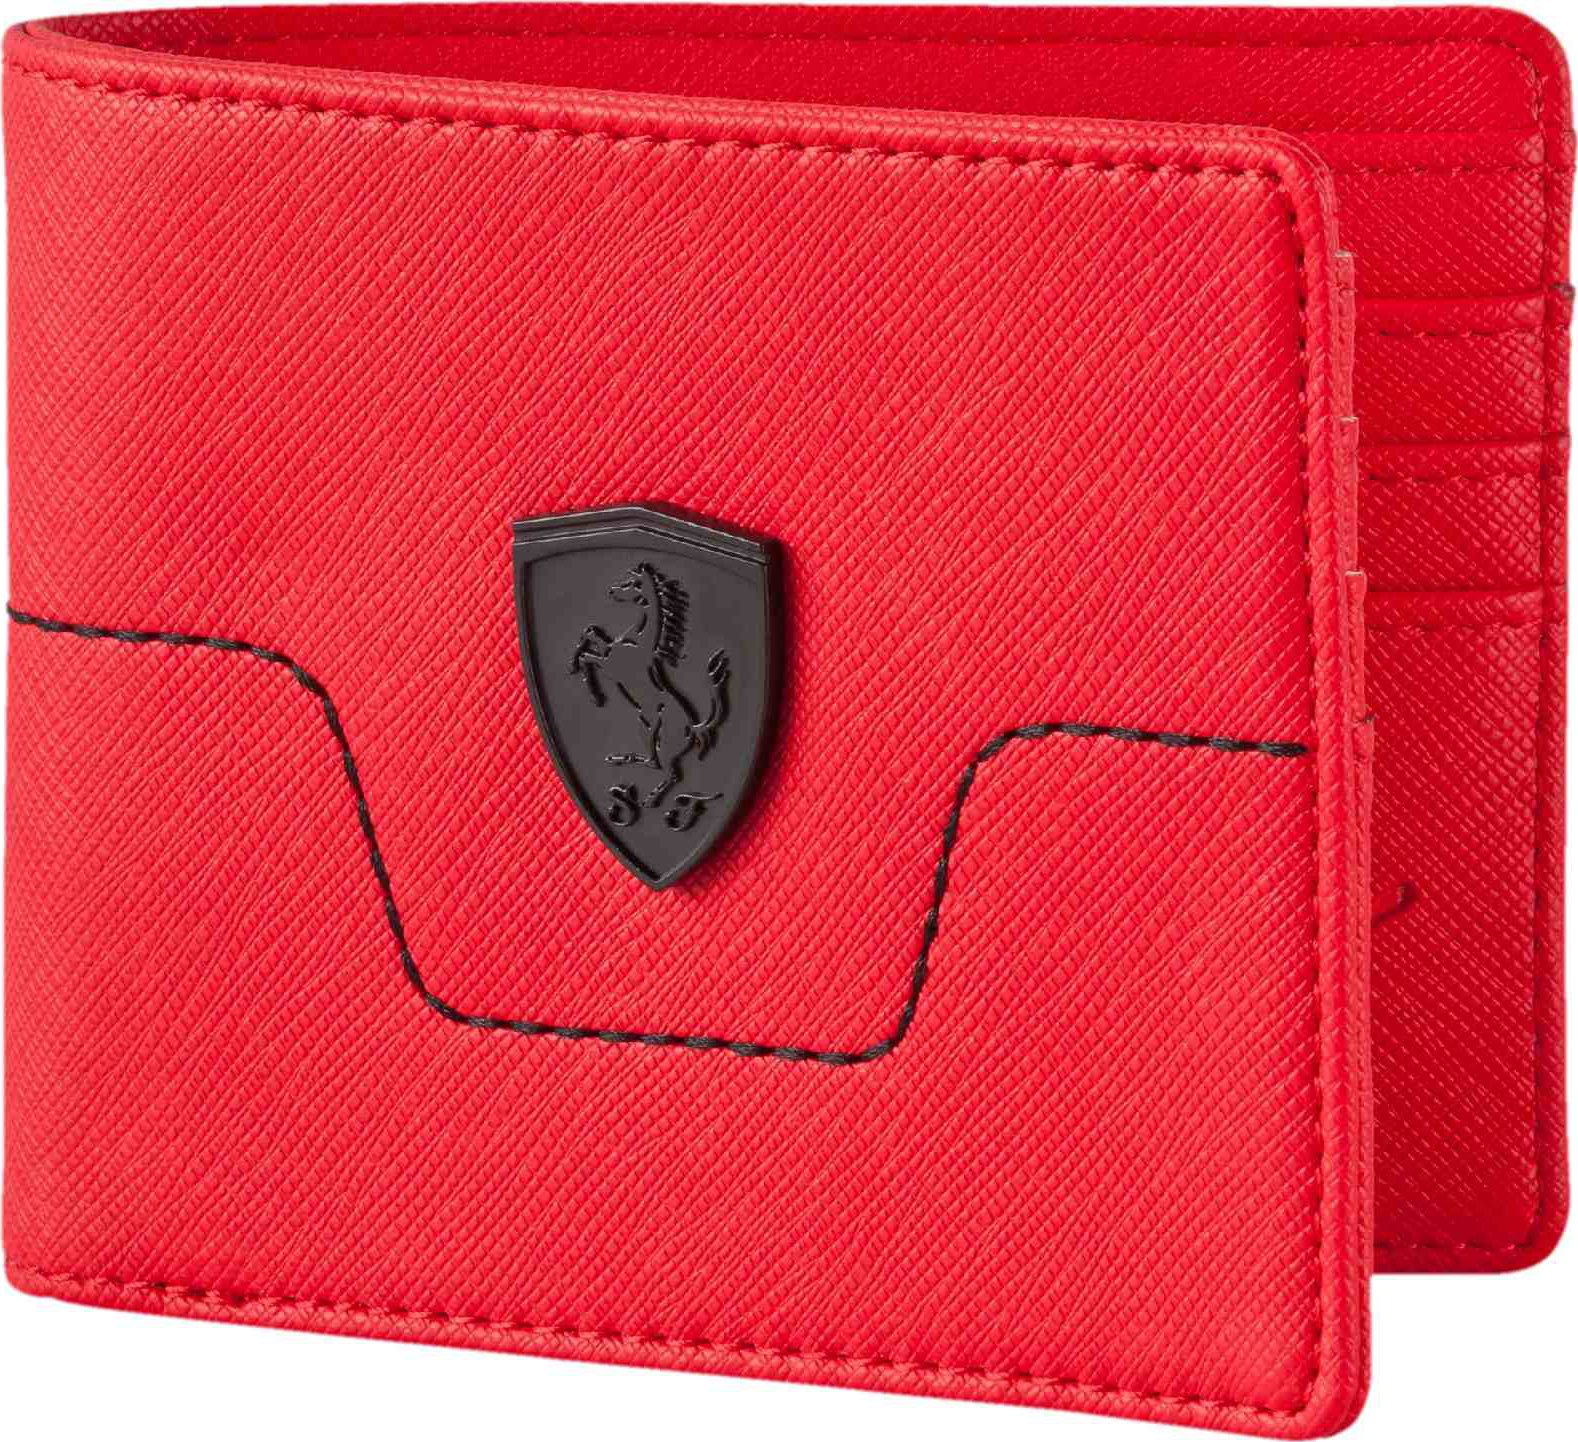 Puma Ferrari LS Wallet M Rosso Cors od 1 099 Kč • Zboží.cz c47d26ee66